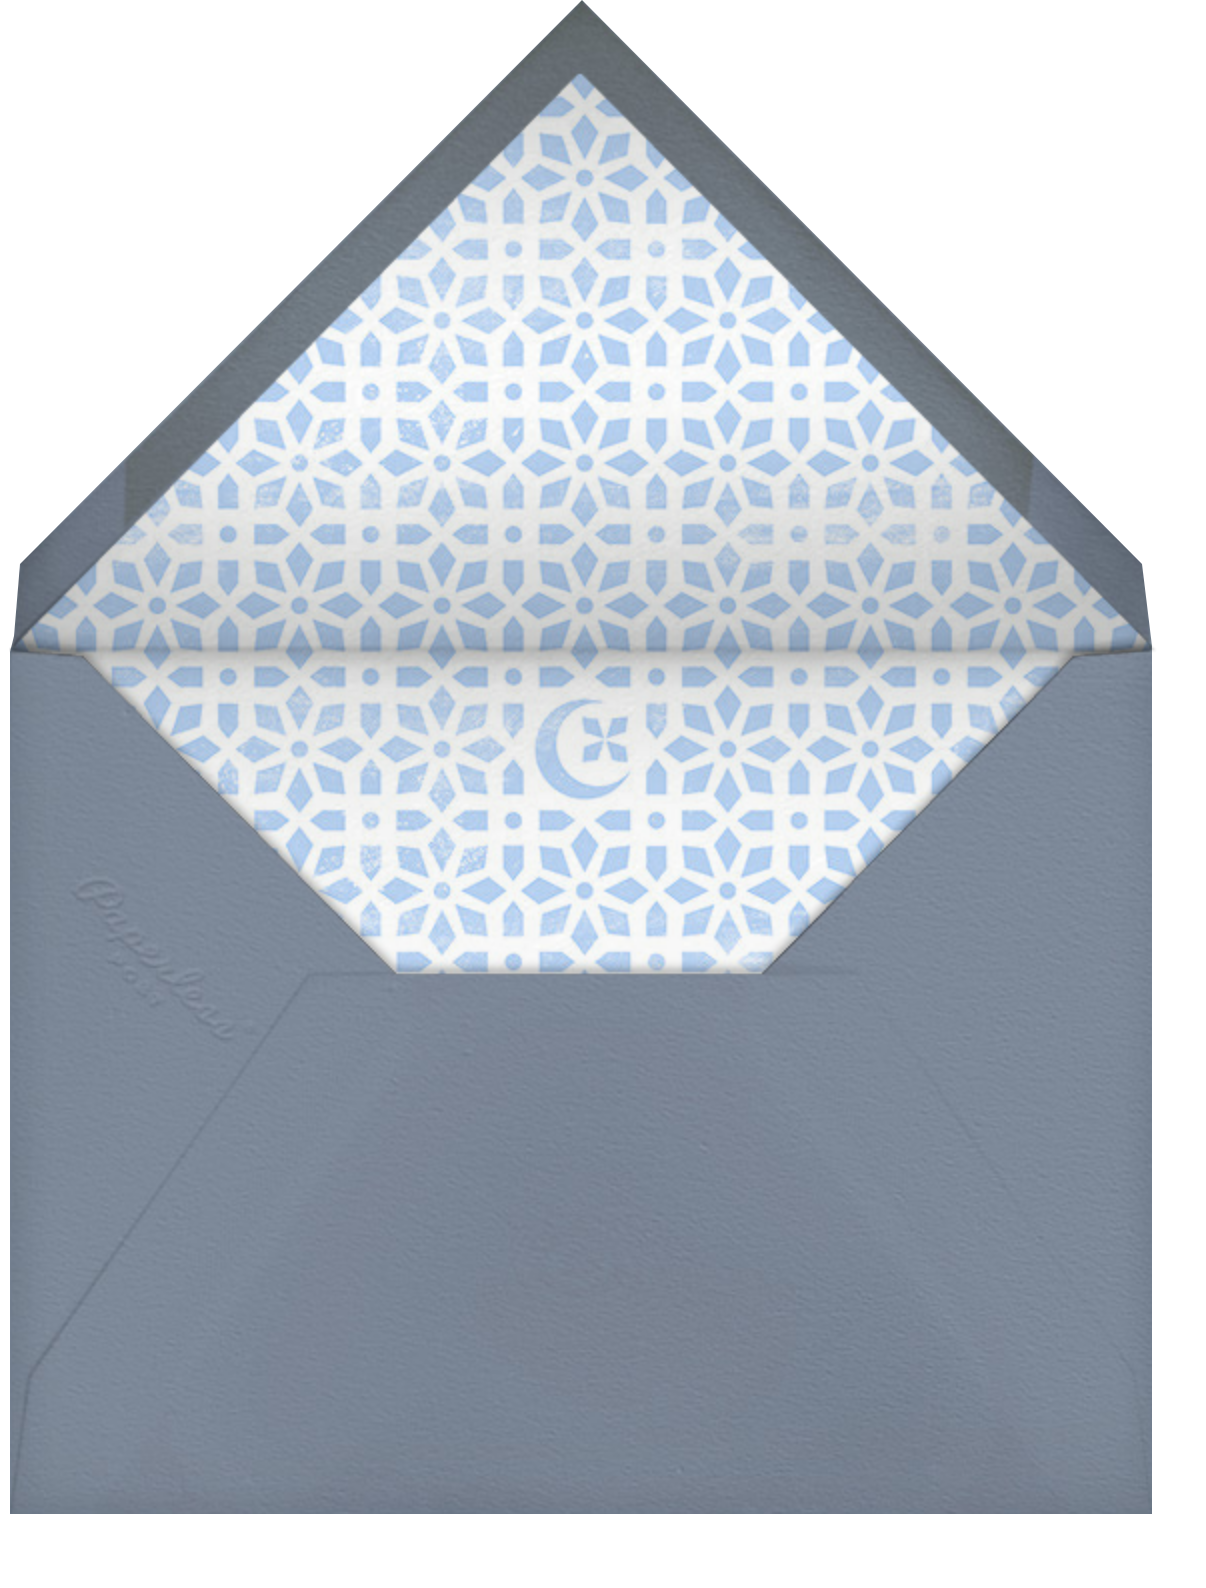 Jali - Woodgrain - Paperless Post - Ramadan - envelope back